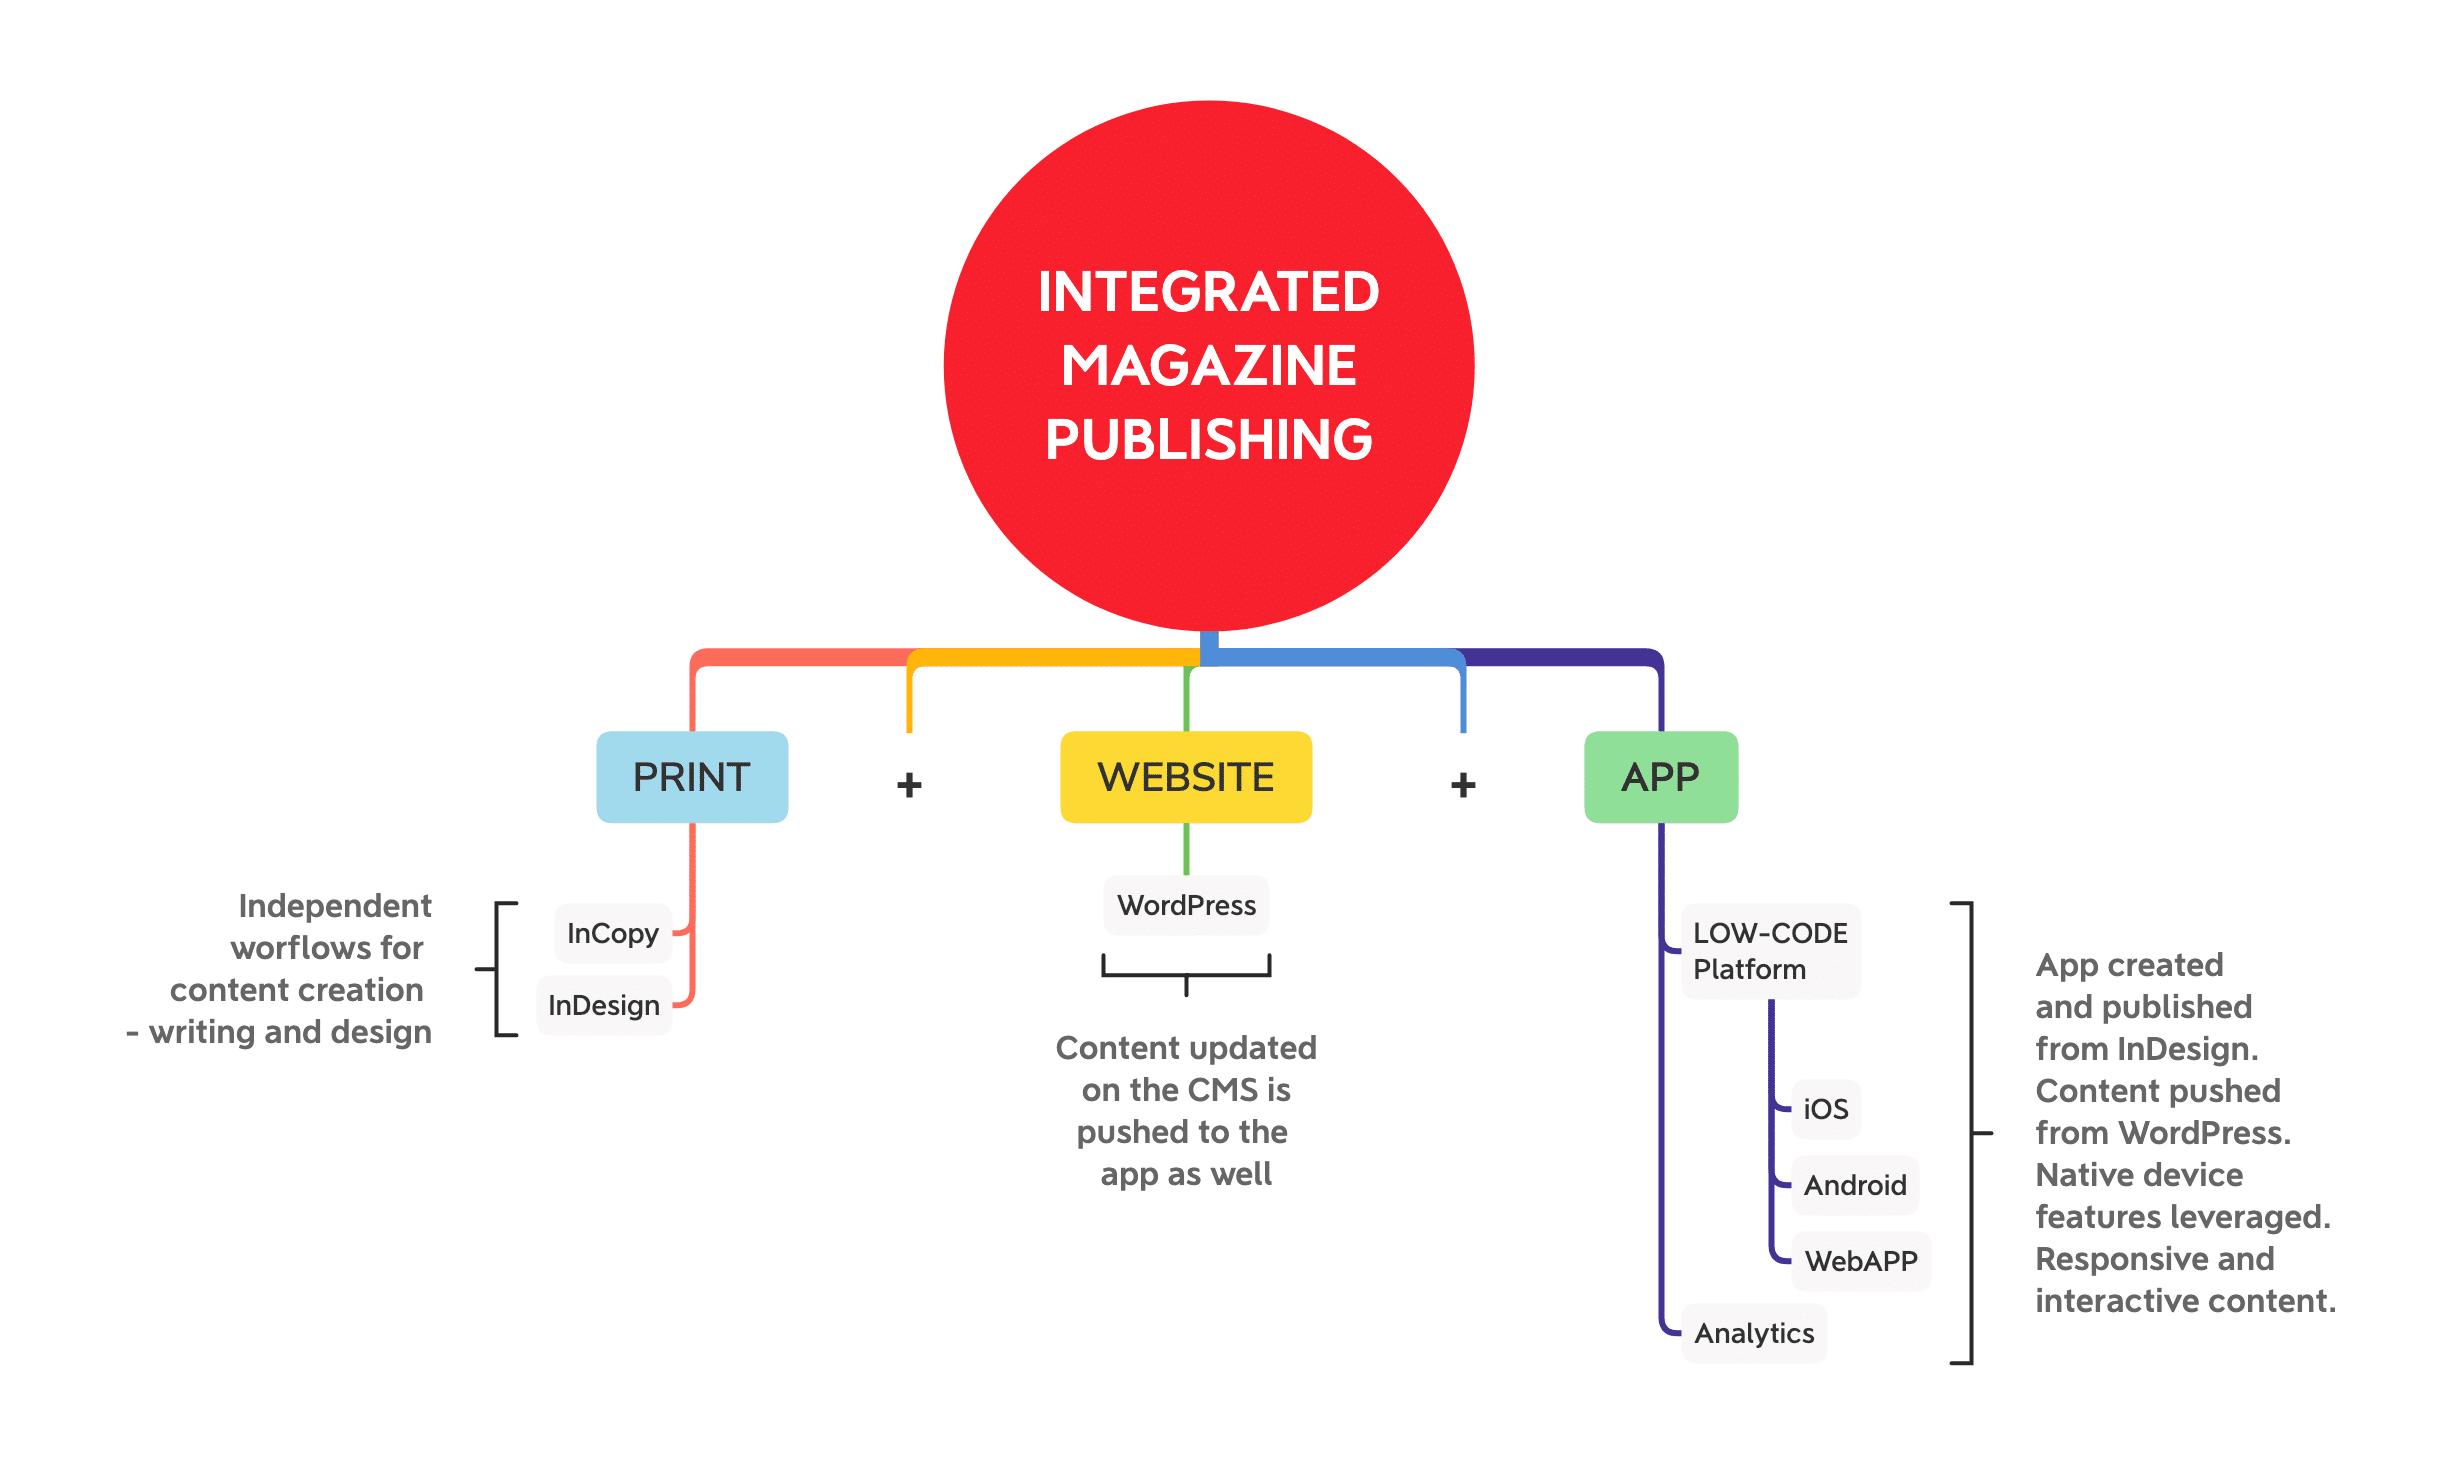 Integrated publishing